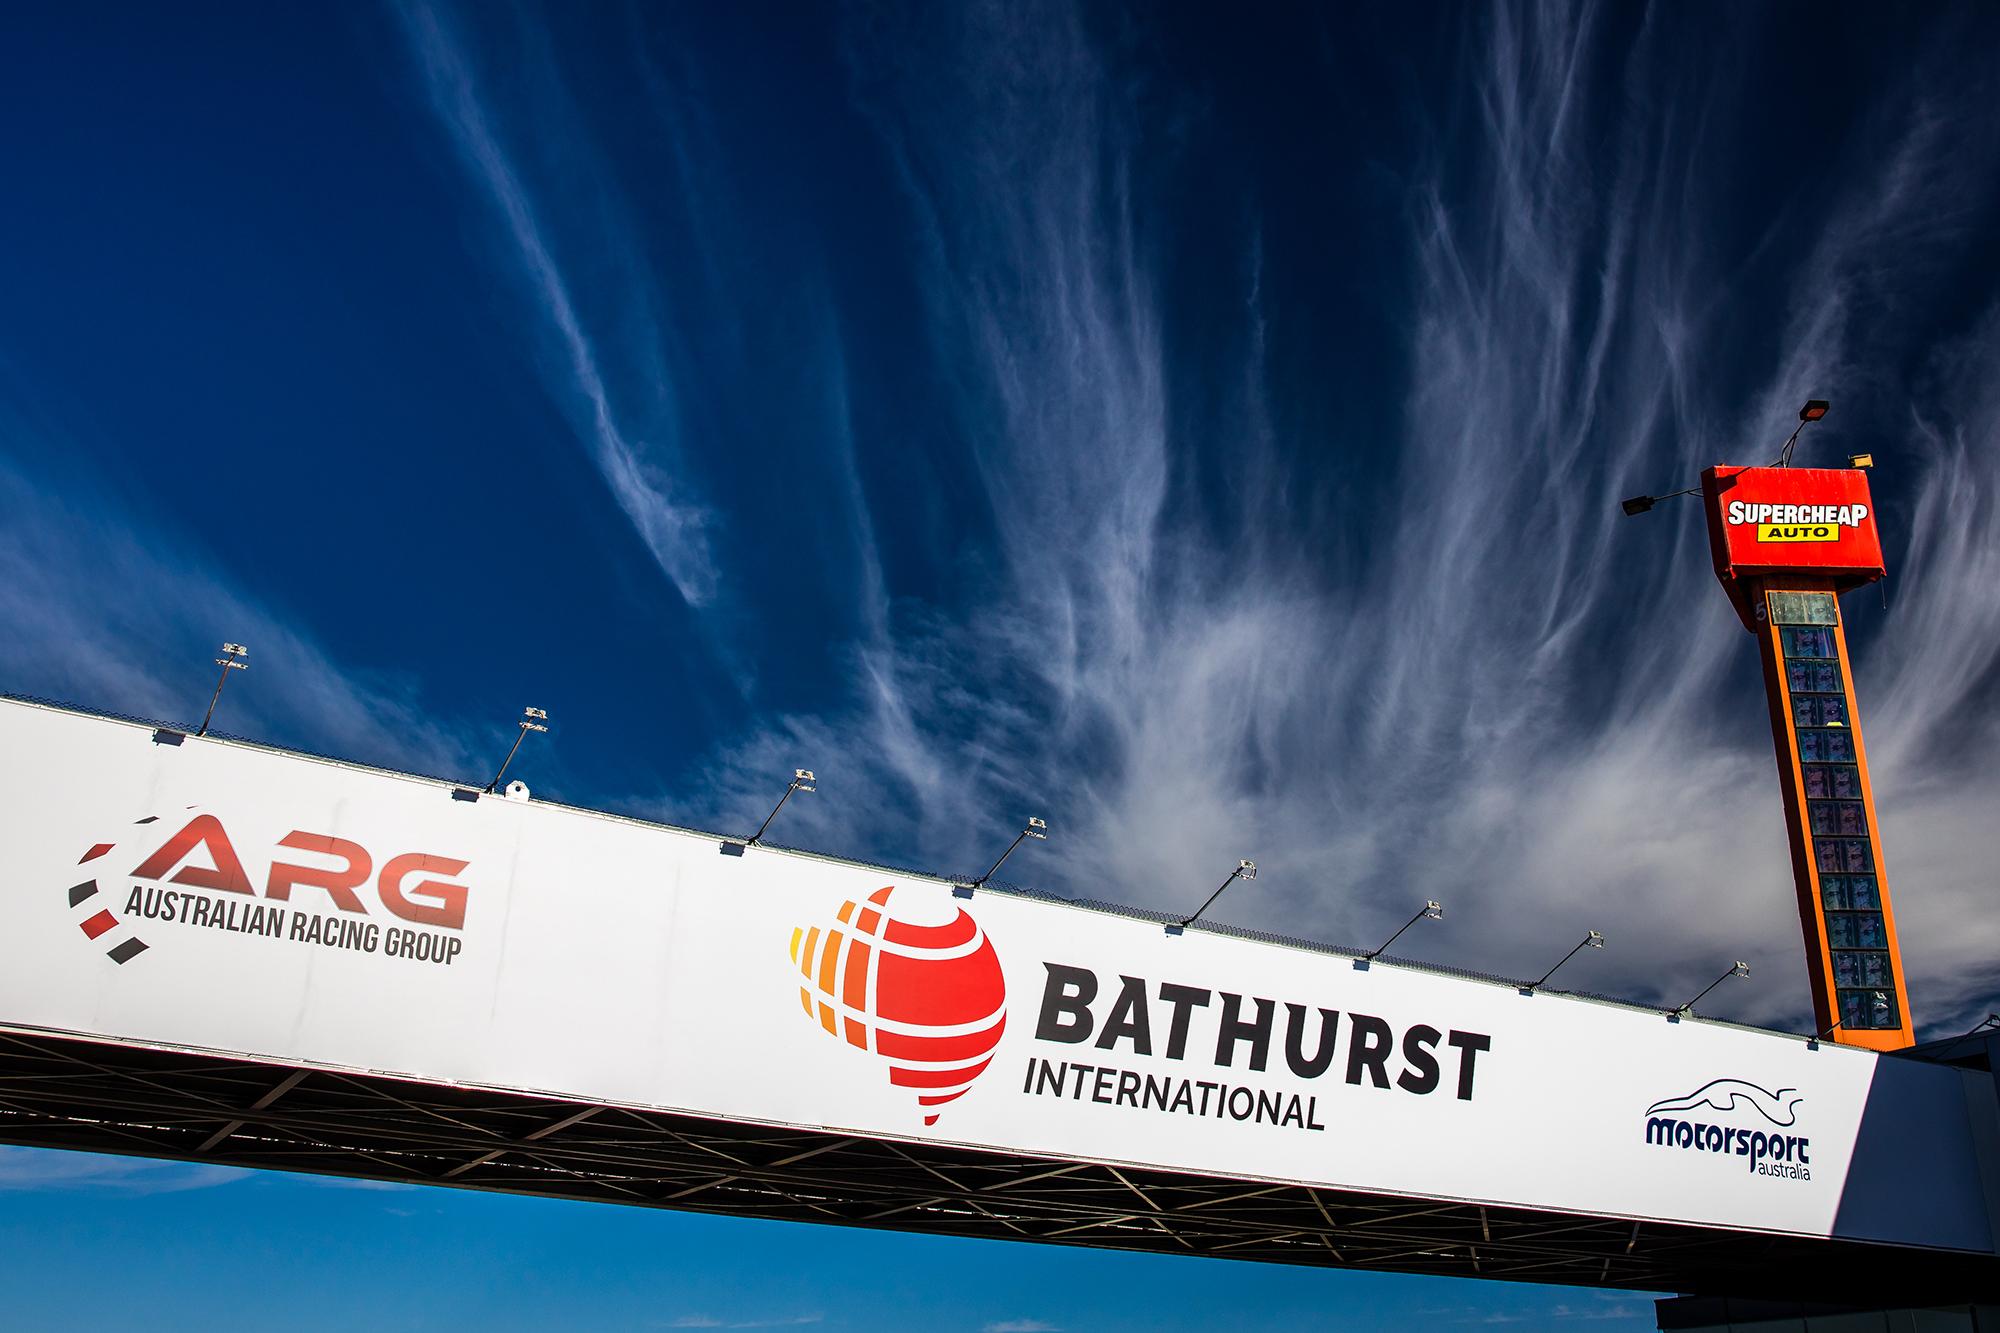 Comment from ARG regarding the cancellation of the Supercheap Auto Bathurst International